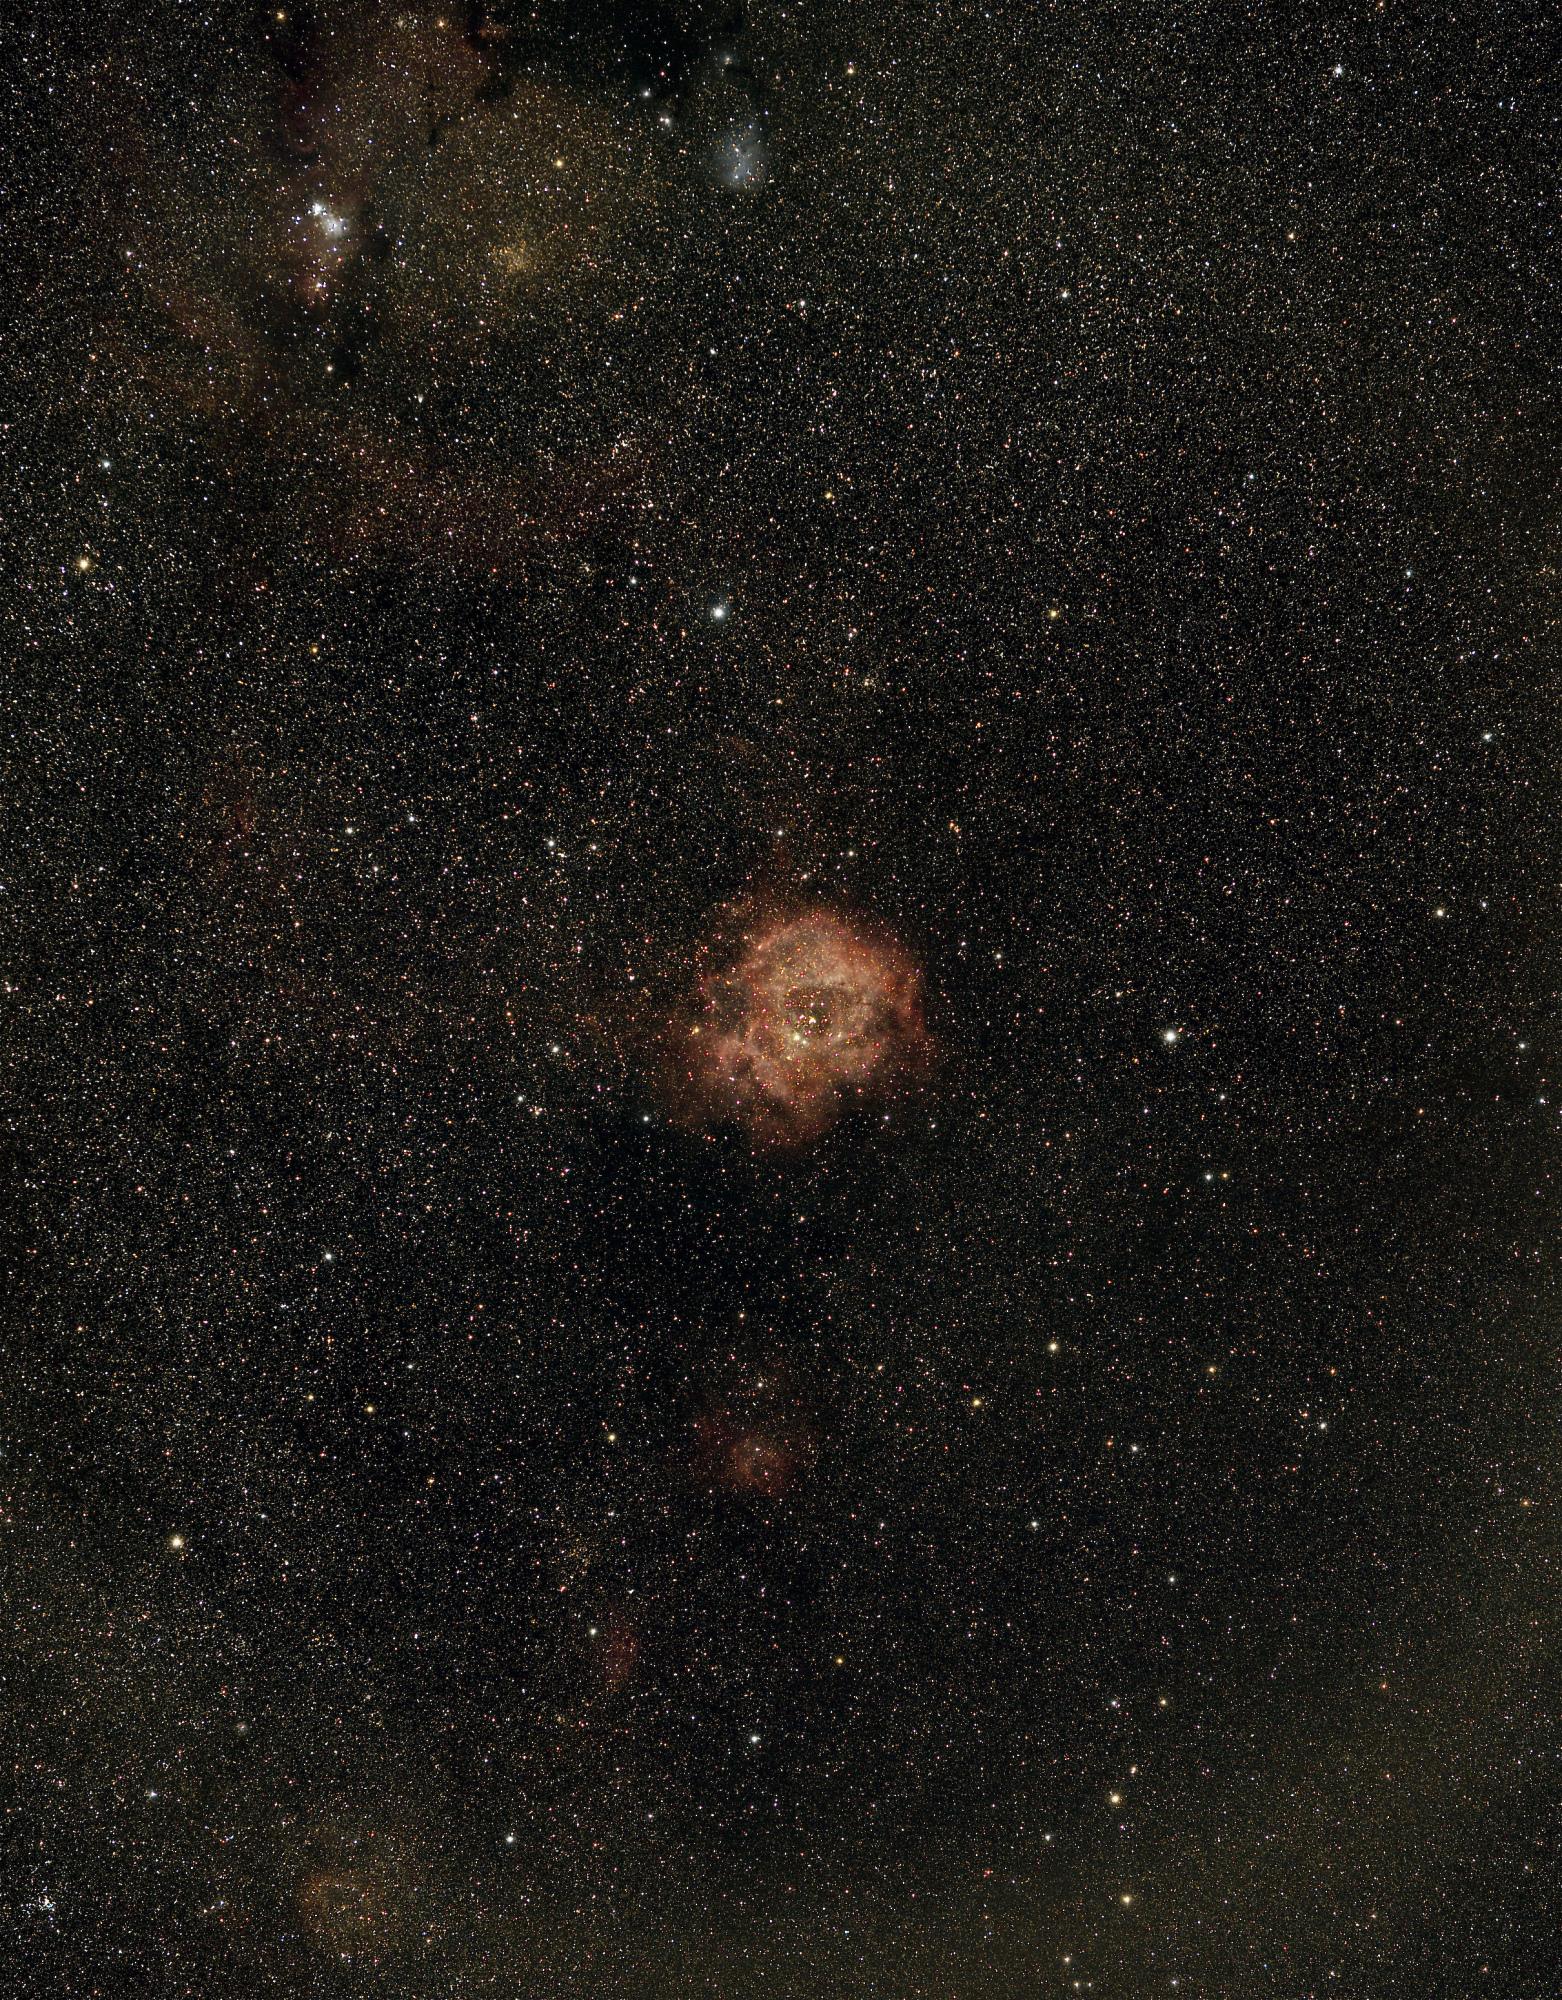 5e553d910f88c_NGC2237Rosette230220.thumb.jpg.4e48ab092002e442e0184202037d2461.jpg